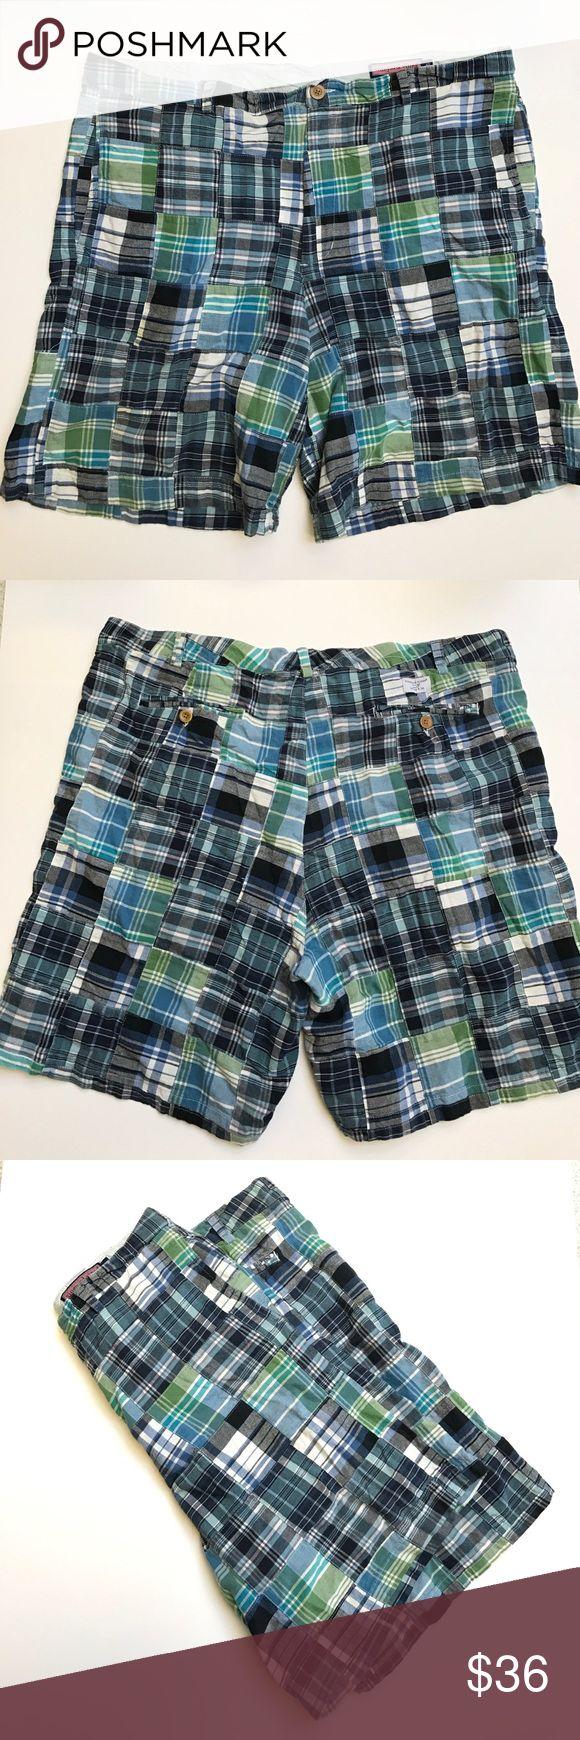 "Vineyard Vines Blue Plaid Cotton Shorts Size 40 Vineyard Vines Blue Plaid Cotton Shorts Size 40 Pre-owned; Slight stain inside of waistline. Smoke free home. Inseam: 8""; Outseam: 20""; Waist: 40 Vineyard Vines Shorts Flat Front"